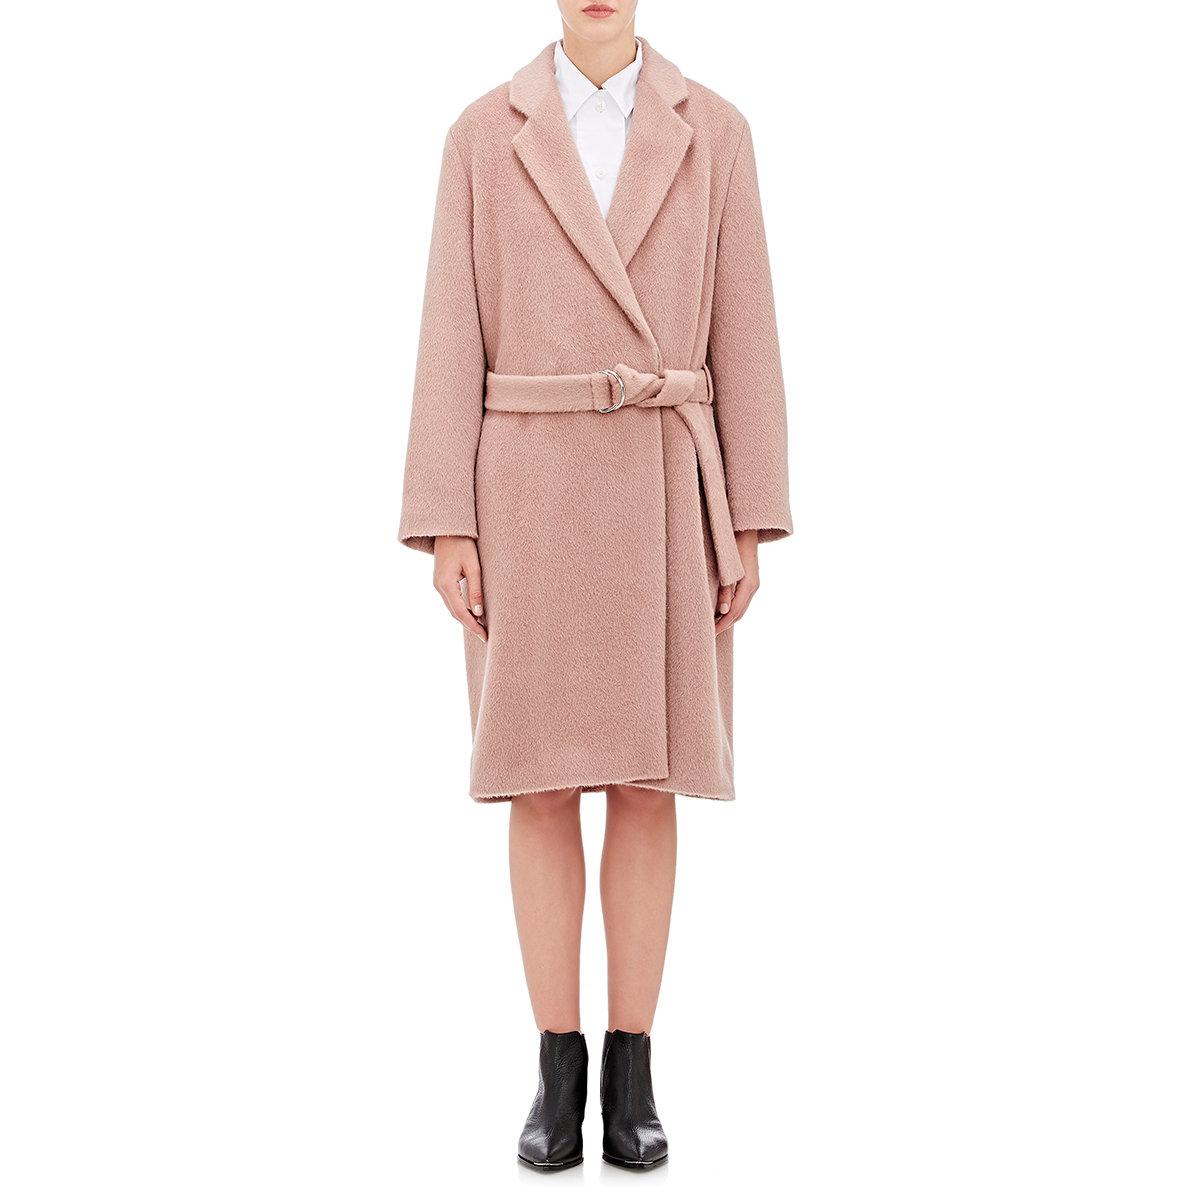 Acne studios Women's Elga Belted Coat in Pink | Lyst